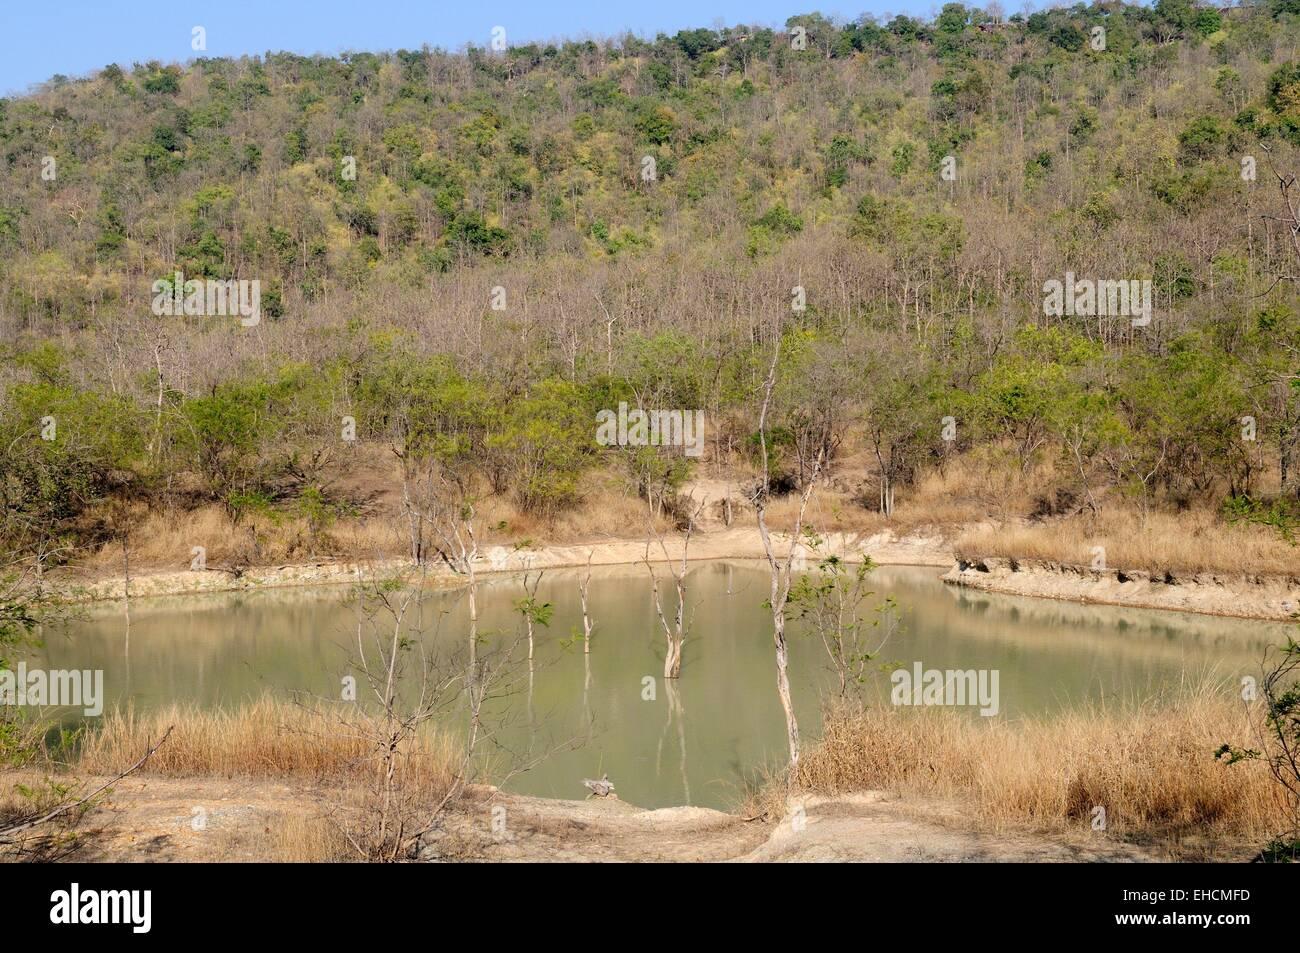 A watering hole at the beginning of the dry season Panna National Park Chhatarpur Madhya Pradesh India - Stock Image